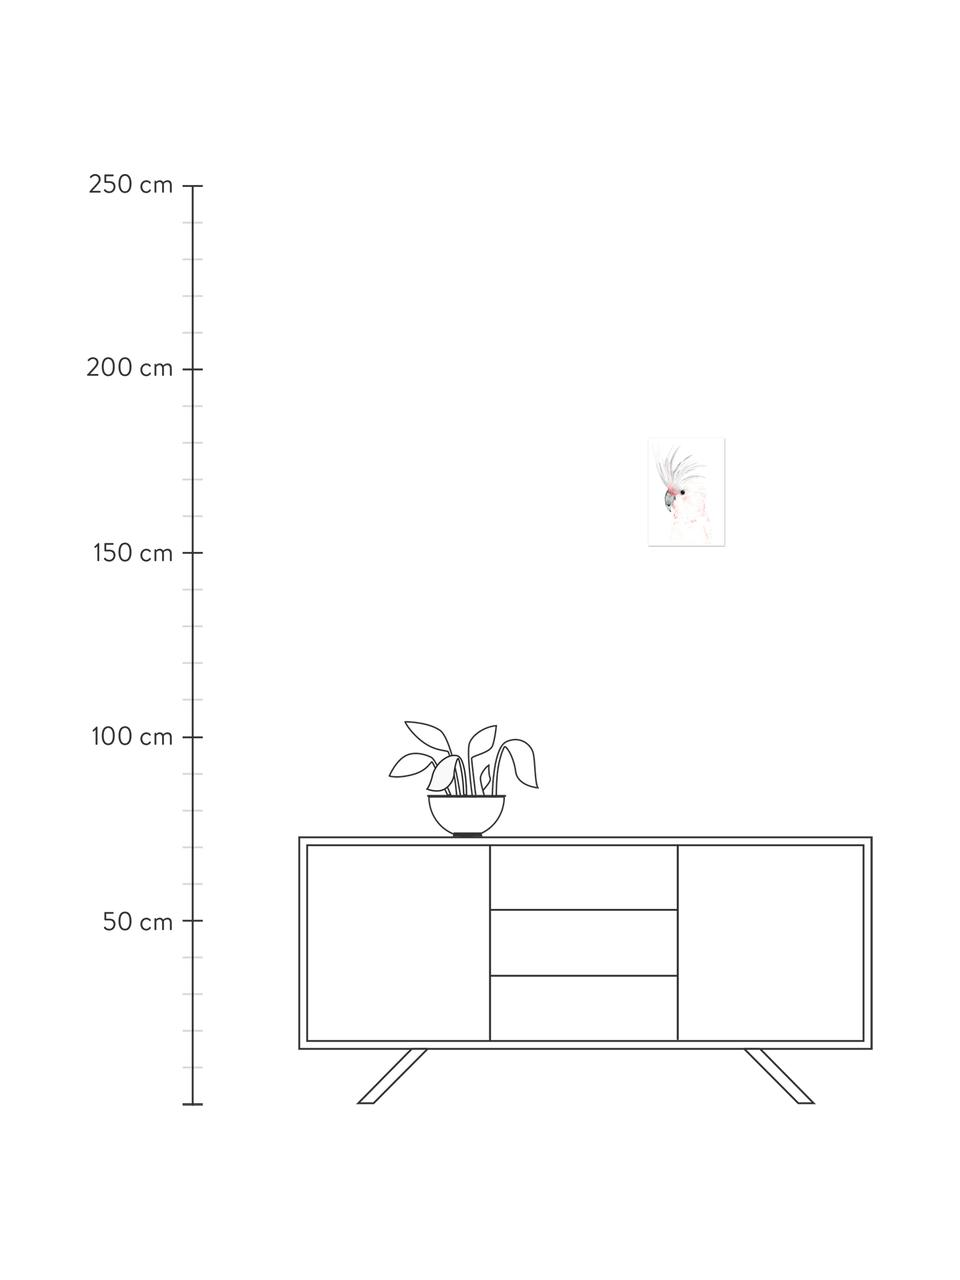 Poster Kakadu, Digitale print op papier, 200 g/m², Wit, grijs, roze, 30 x 42 cm